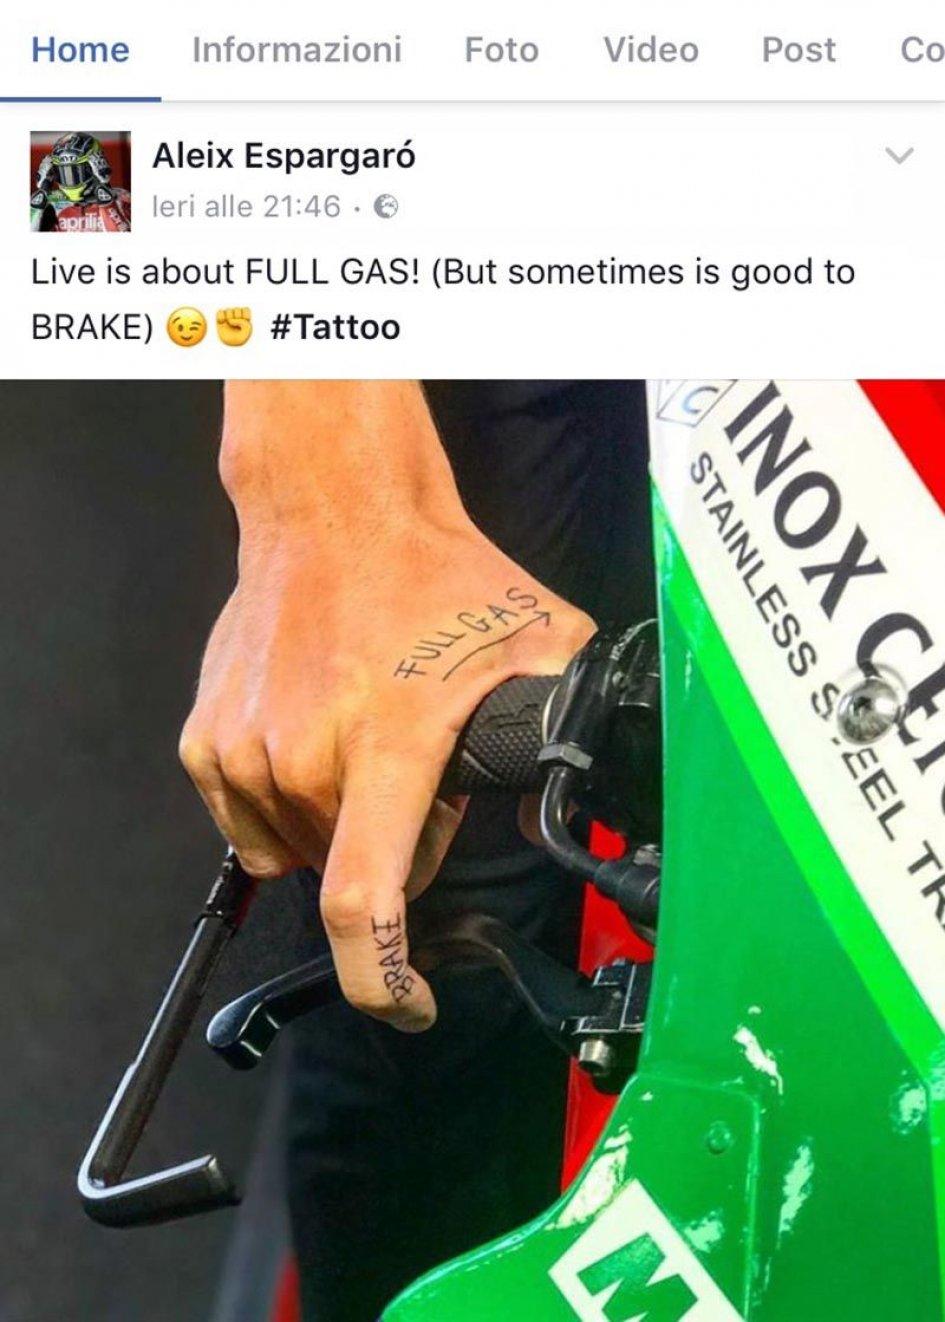 MotoGP: Aleix Espargarò: un tatuaggio a tutto gas